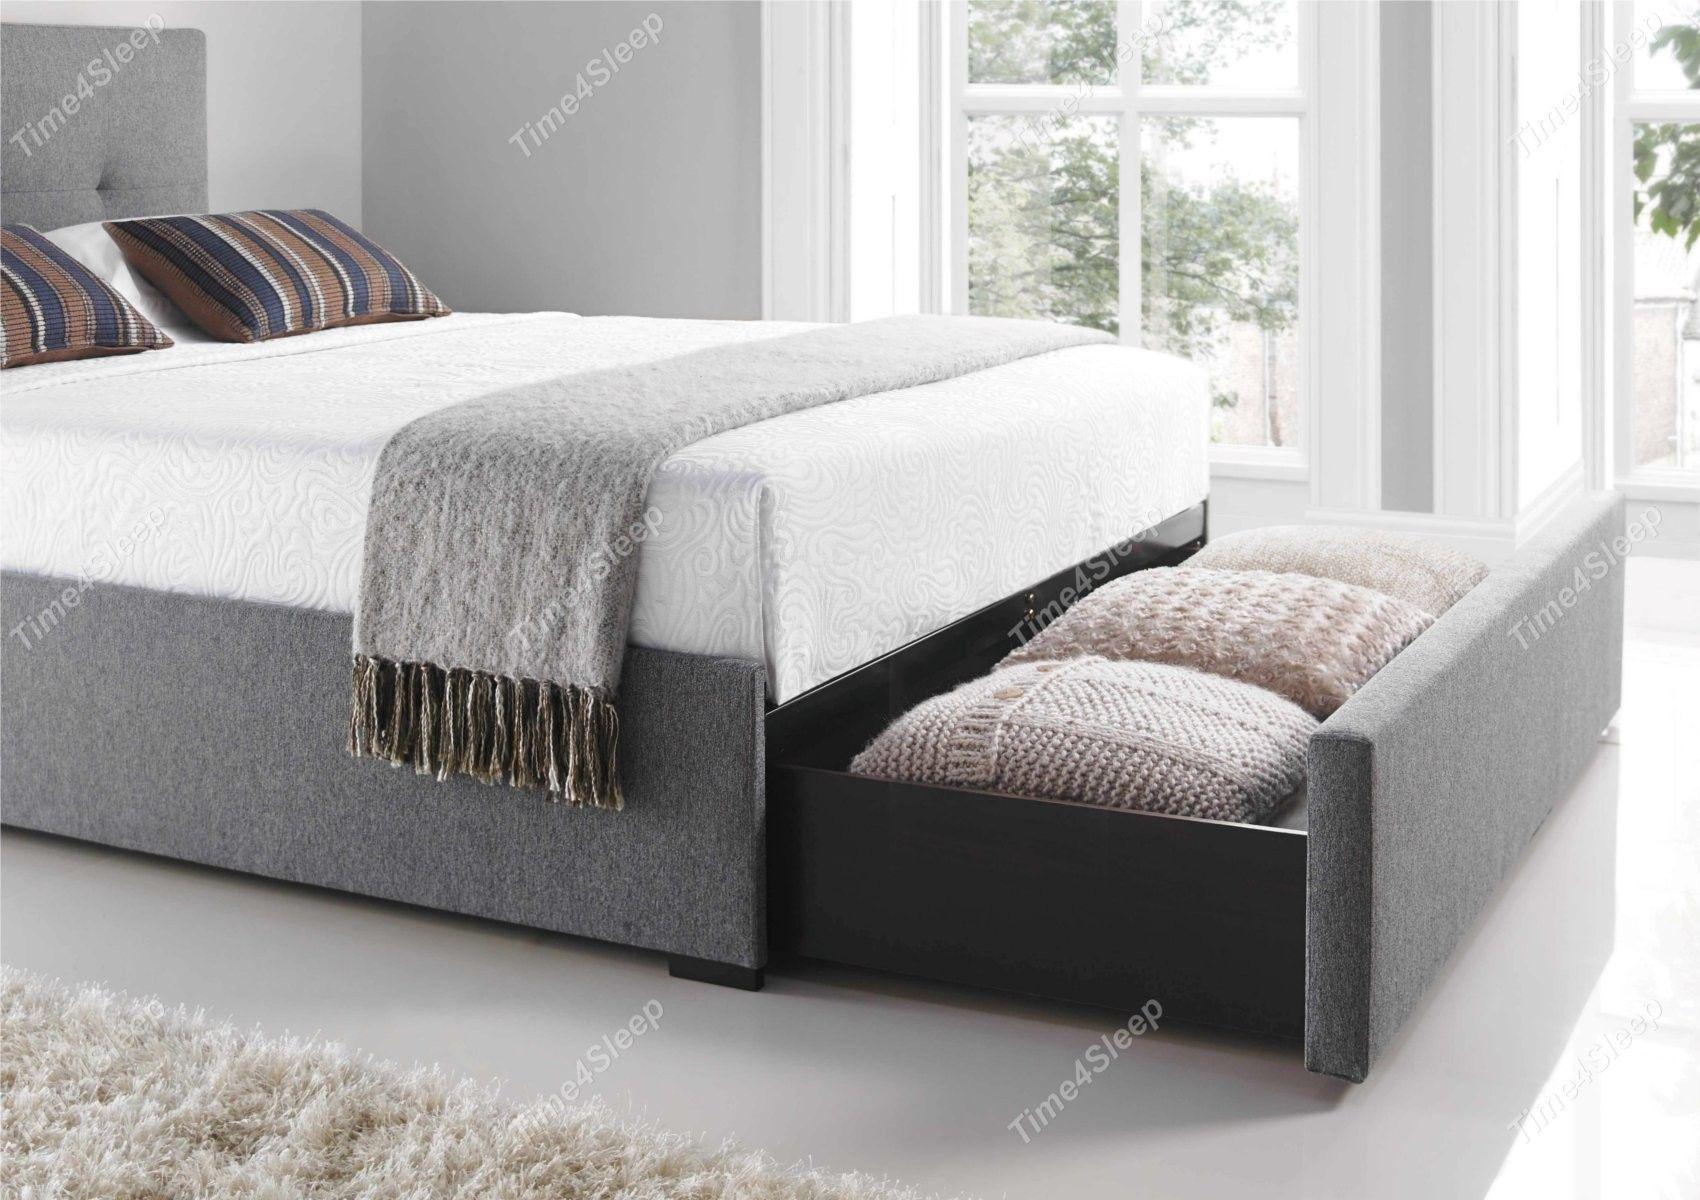 Best Kaydian Hexham Upholstered Storage Drawer Bed Smoke 640 x 480